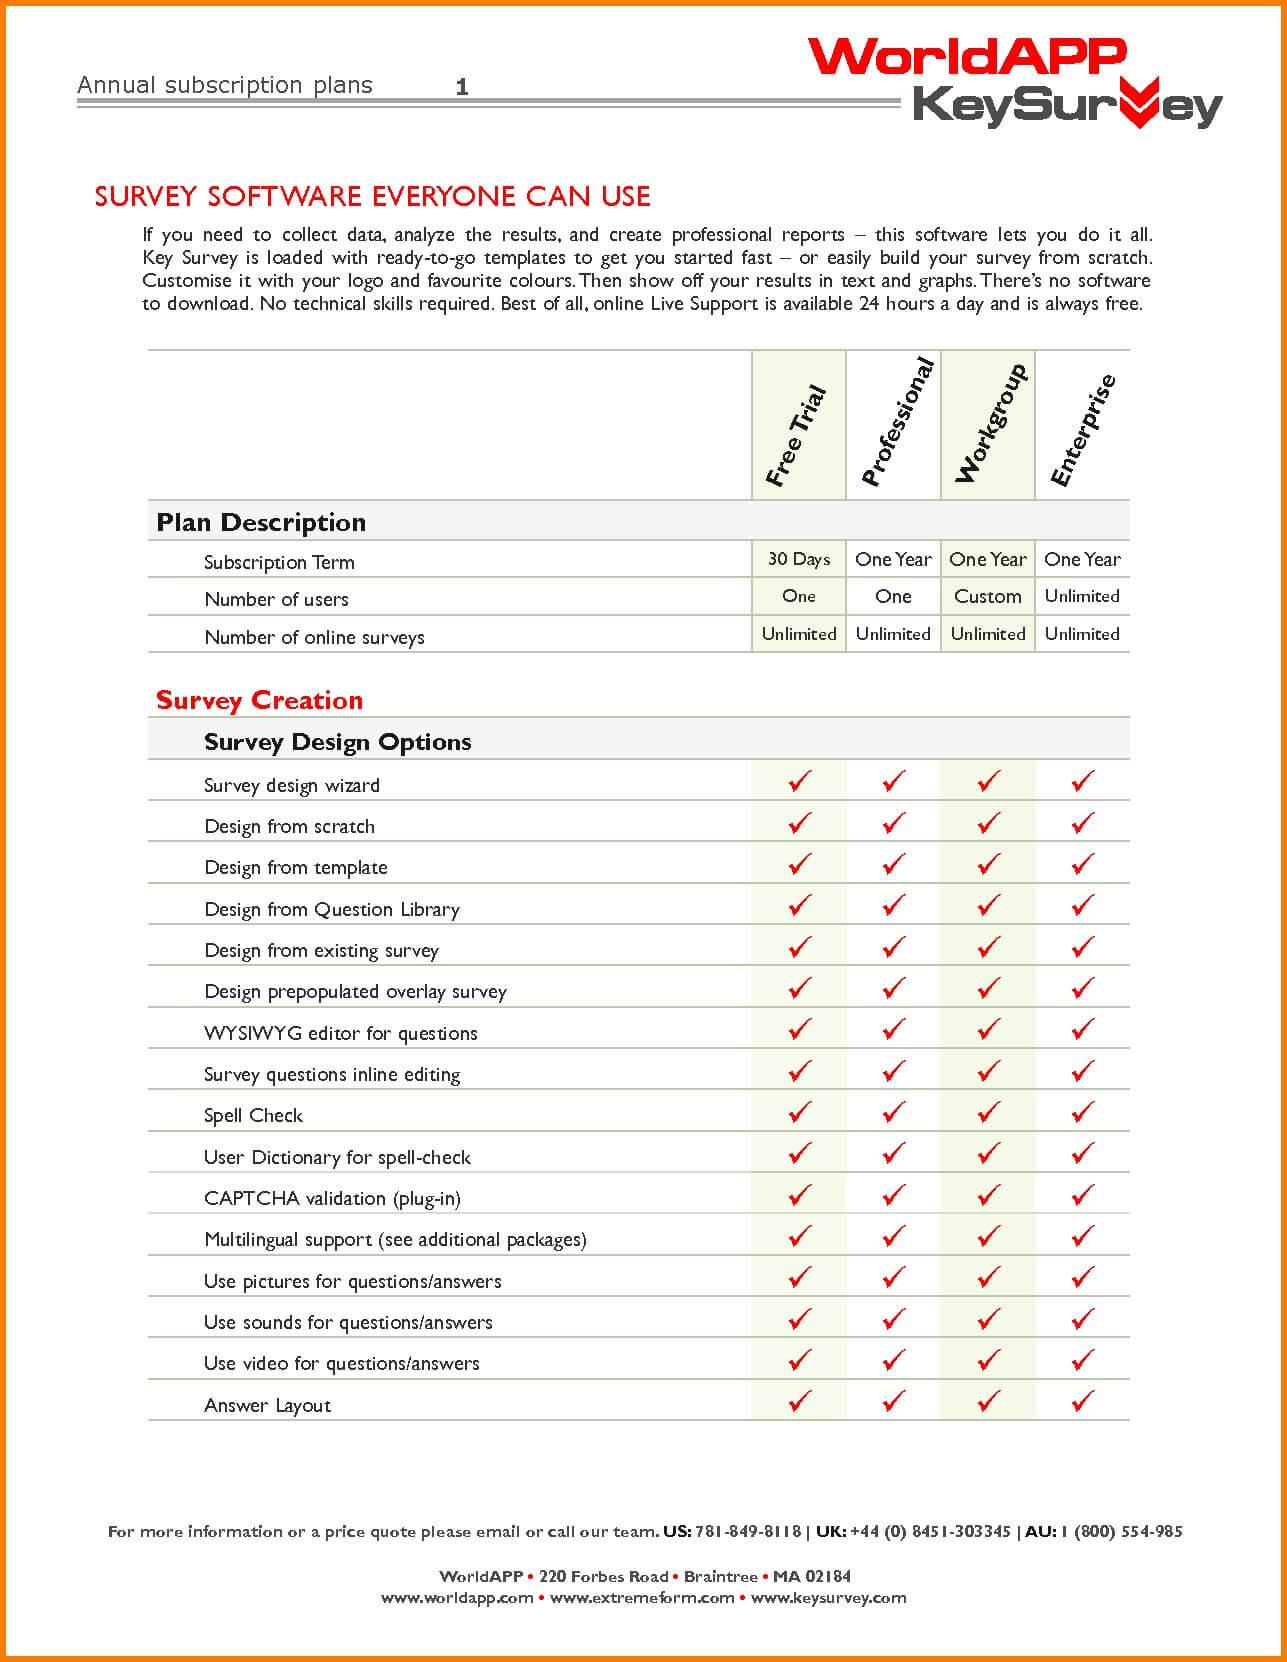 001 Microsoft Word Survey Template Ideas Questionnaire Inside Questionnaire Design Template Word